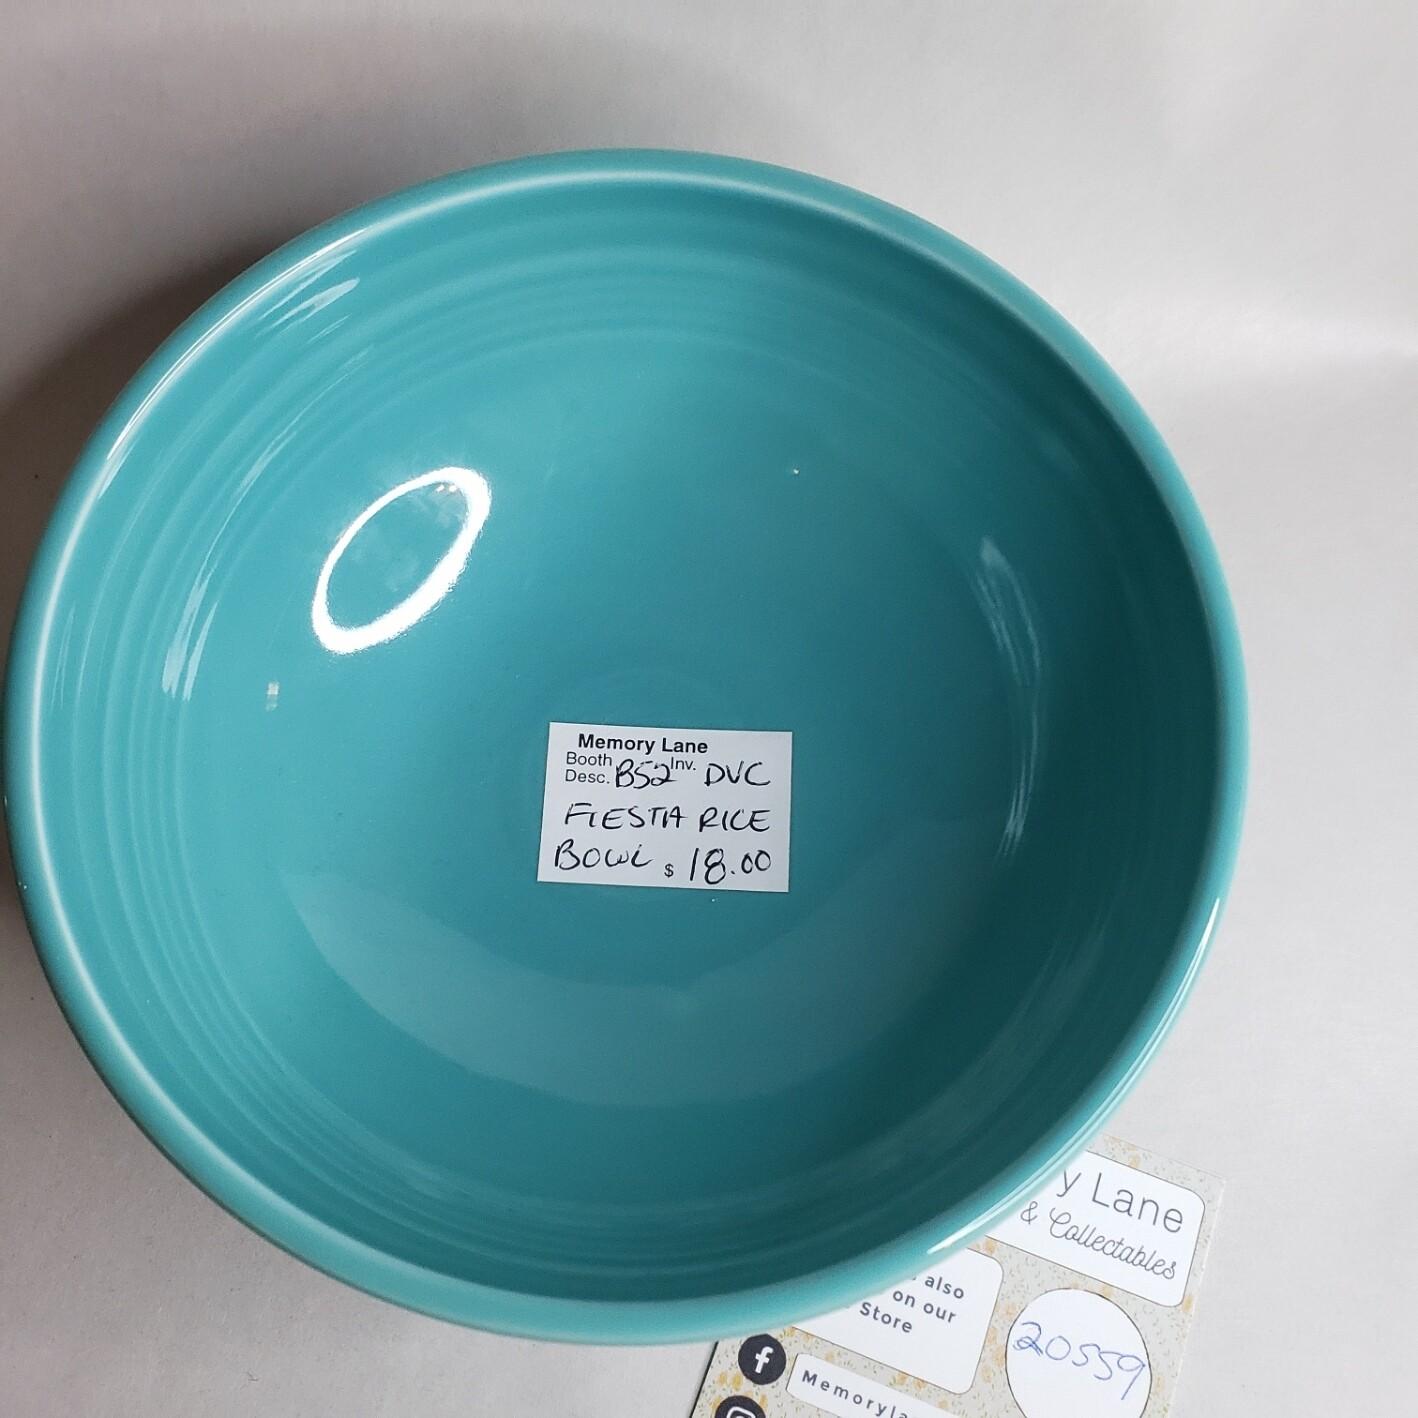 Fiesta Rice Bowl - B52